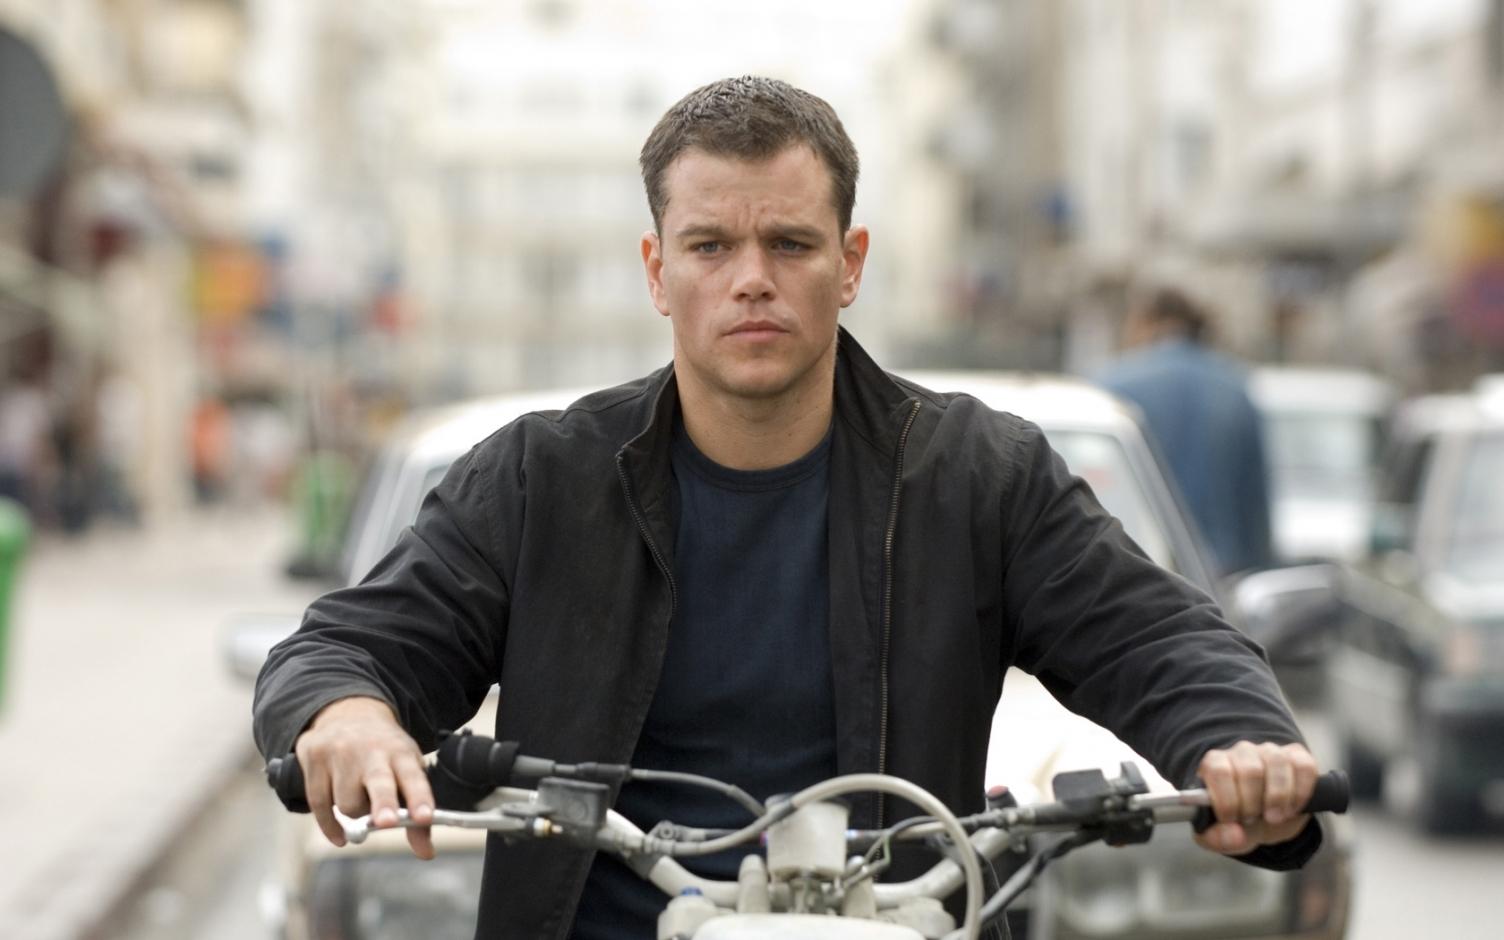 Matt Damon in The Bourne Ultimatum (2007)